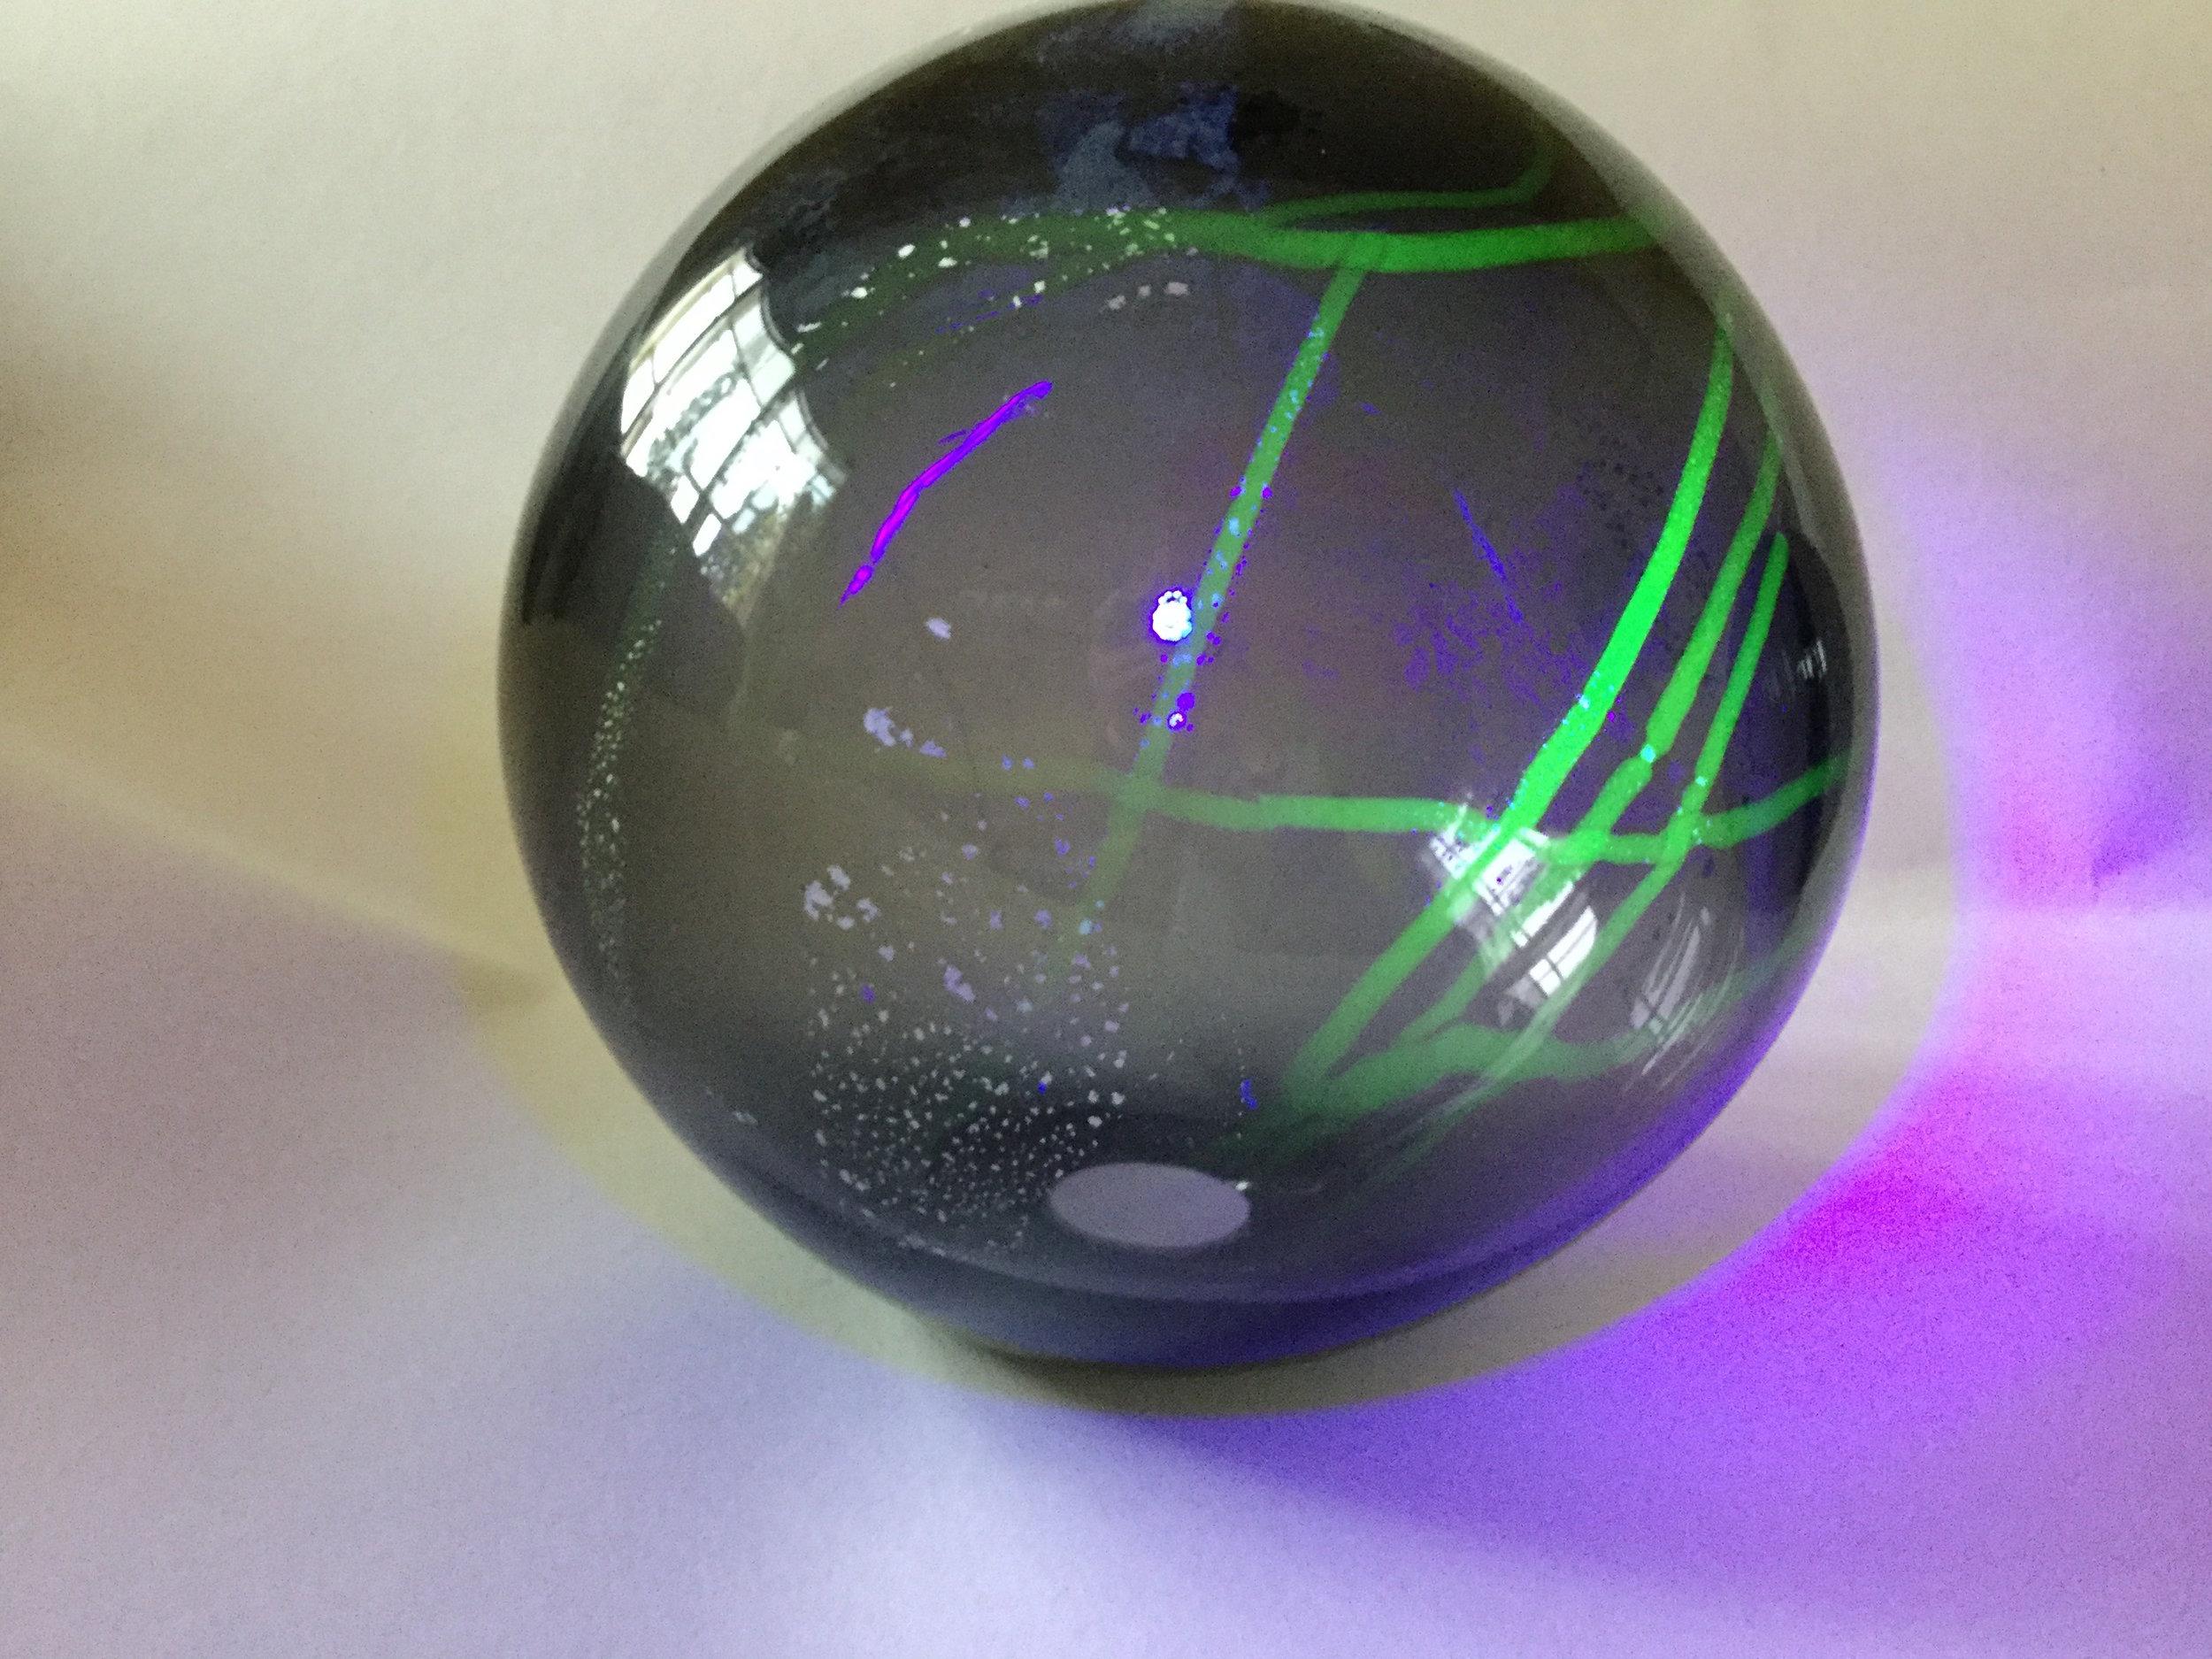 50b_Gillian McFarland, Glass globe with Uranium glass & UV light 2.JPG